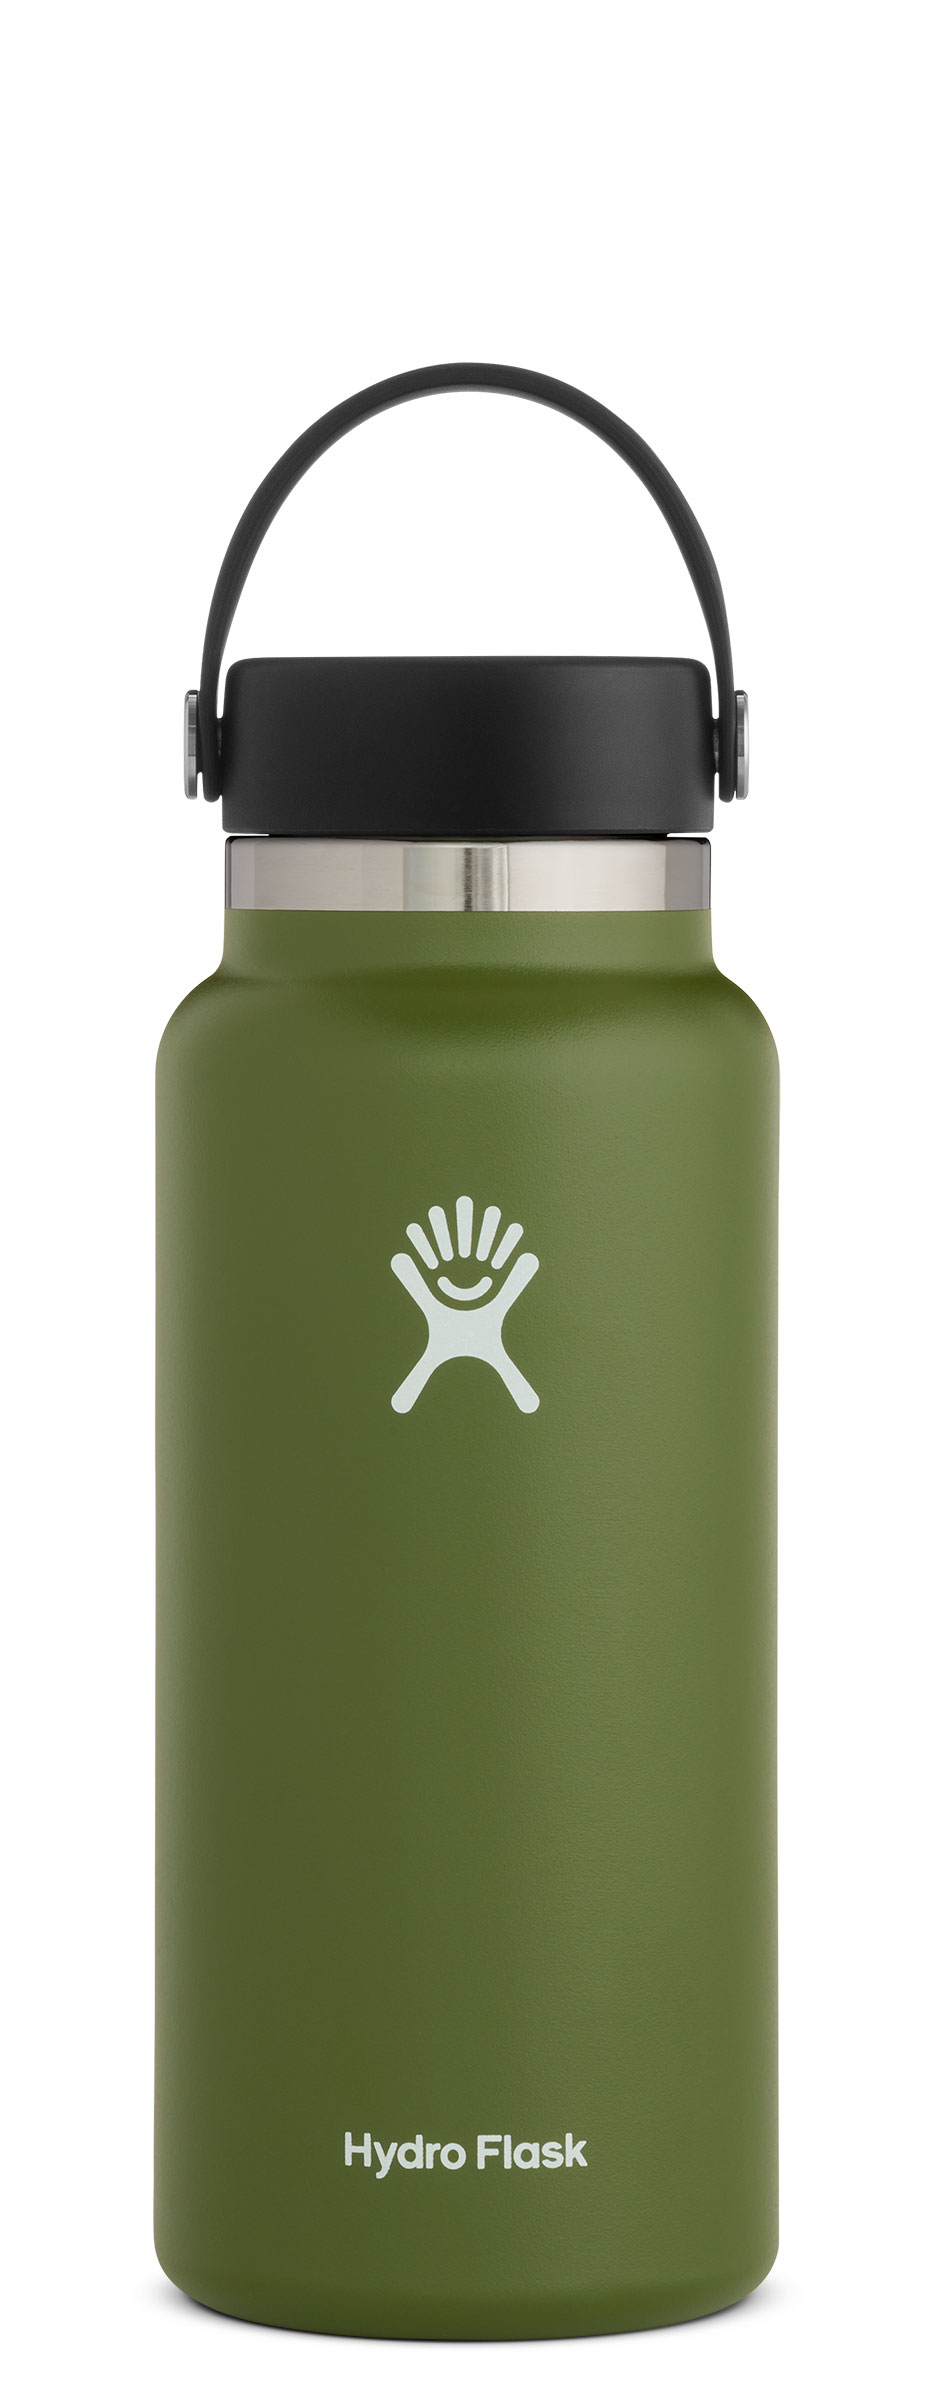 Hydroflask 0.9L Wide Mouth 2.0 Flex Cap drikkeflaske Olive: W32BTS306 2020